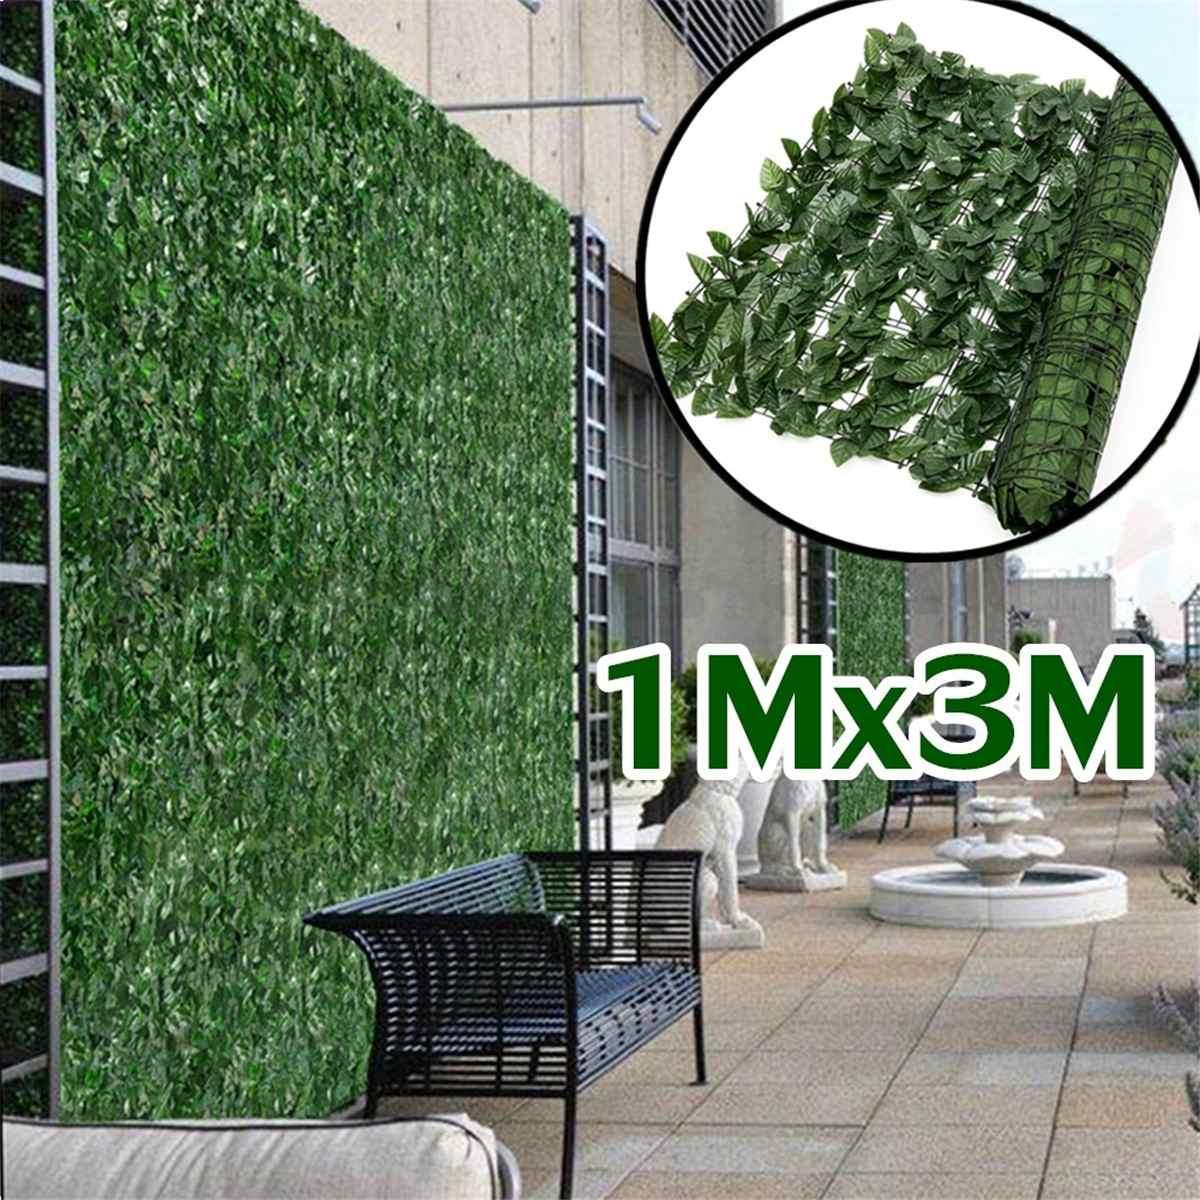 Plant Wall Artificial Lawn Boxwood Hedge Garden Backyard Home Decor Simulation Grass Turf Rug Lawn Outdoor Flower Wall 1x3M